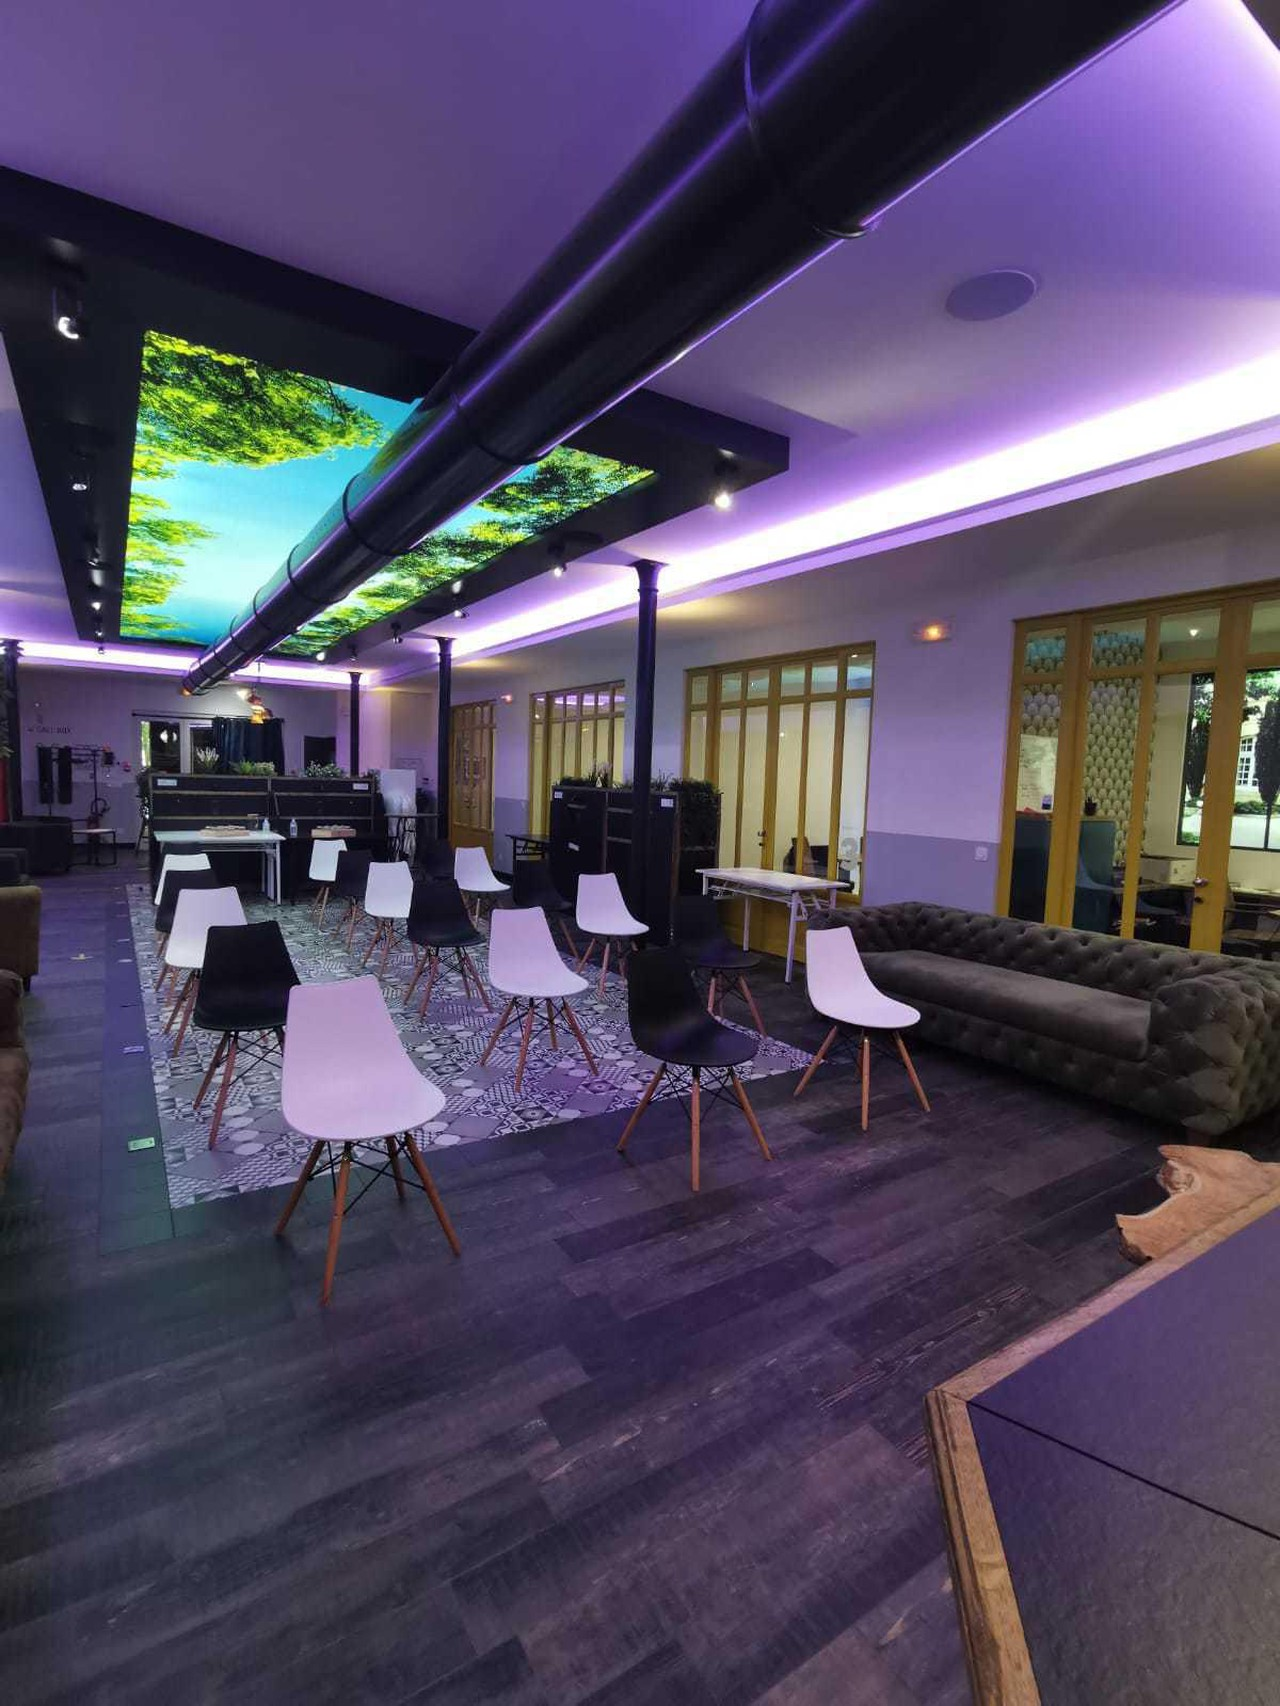 Bordeaux Salles de formation  Meetingraum Big Meeting Room image 2